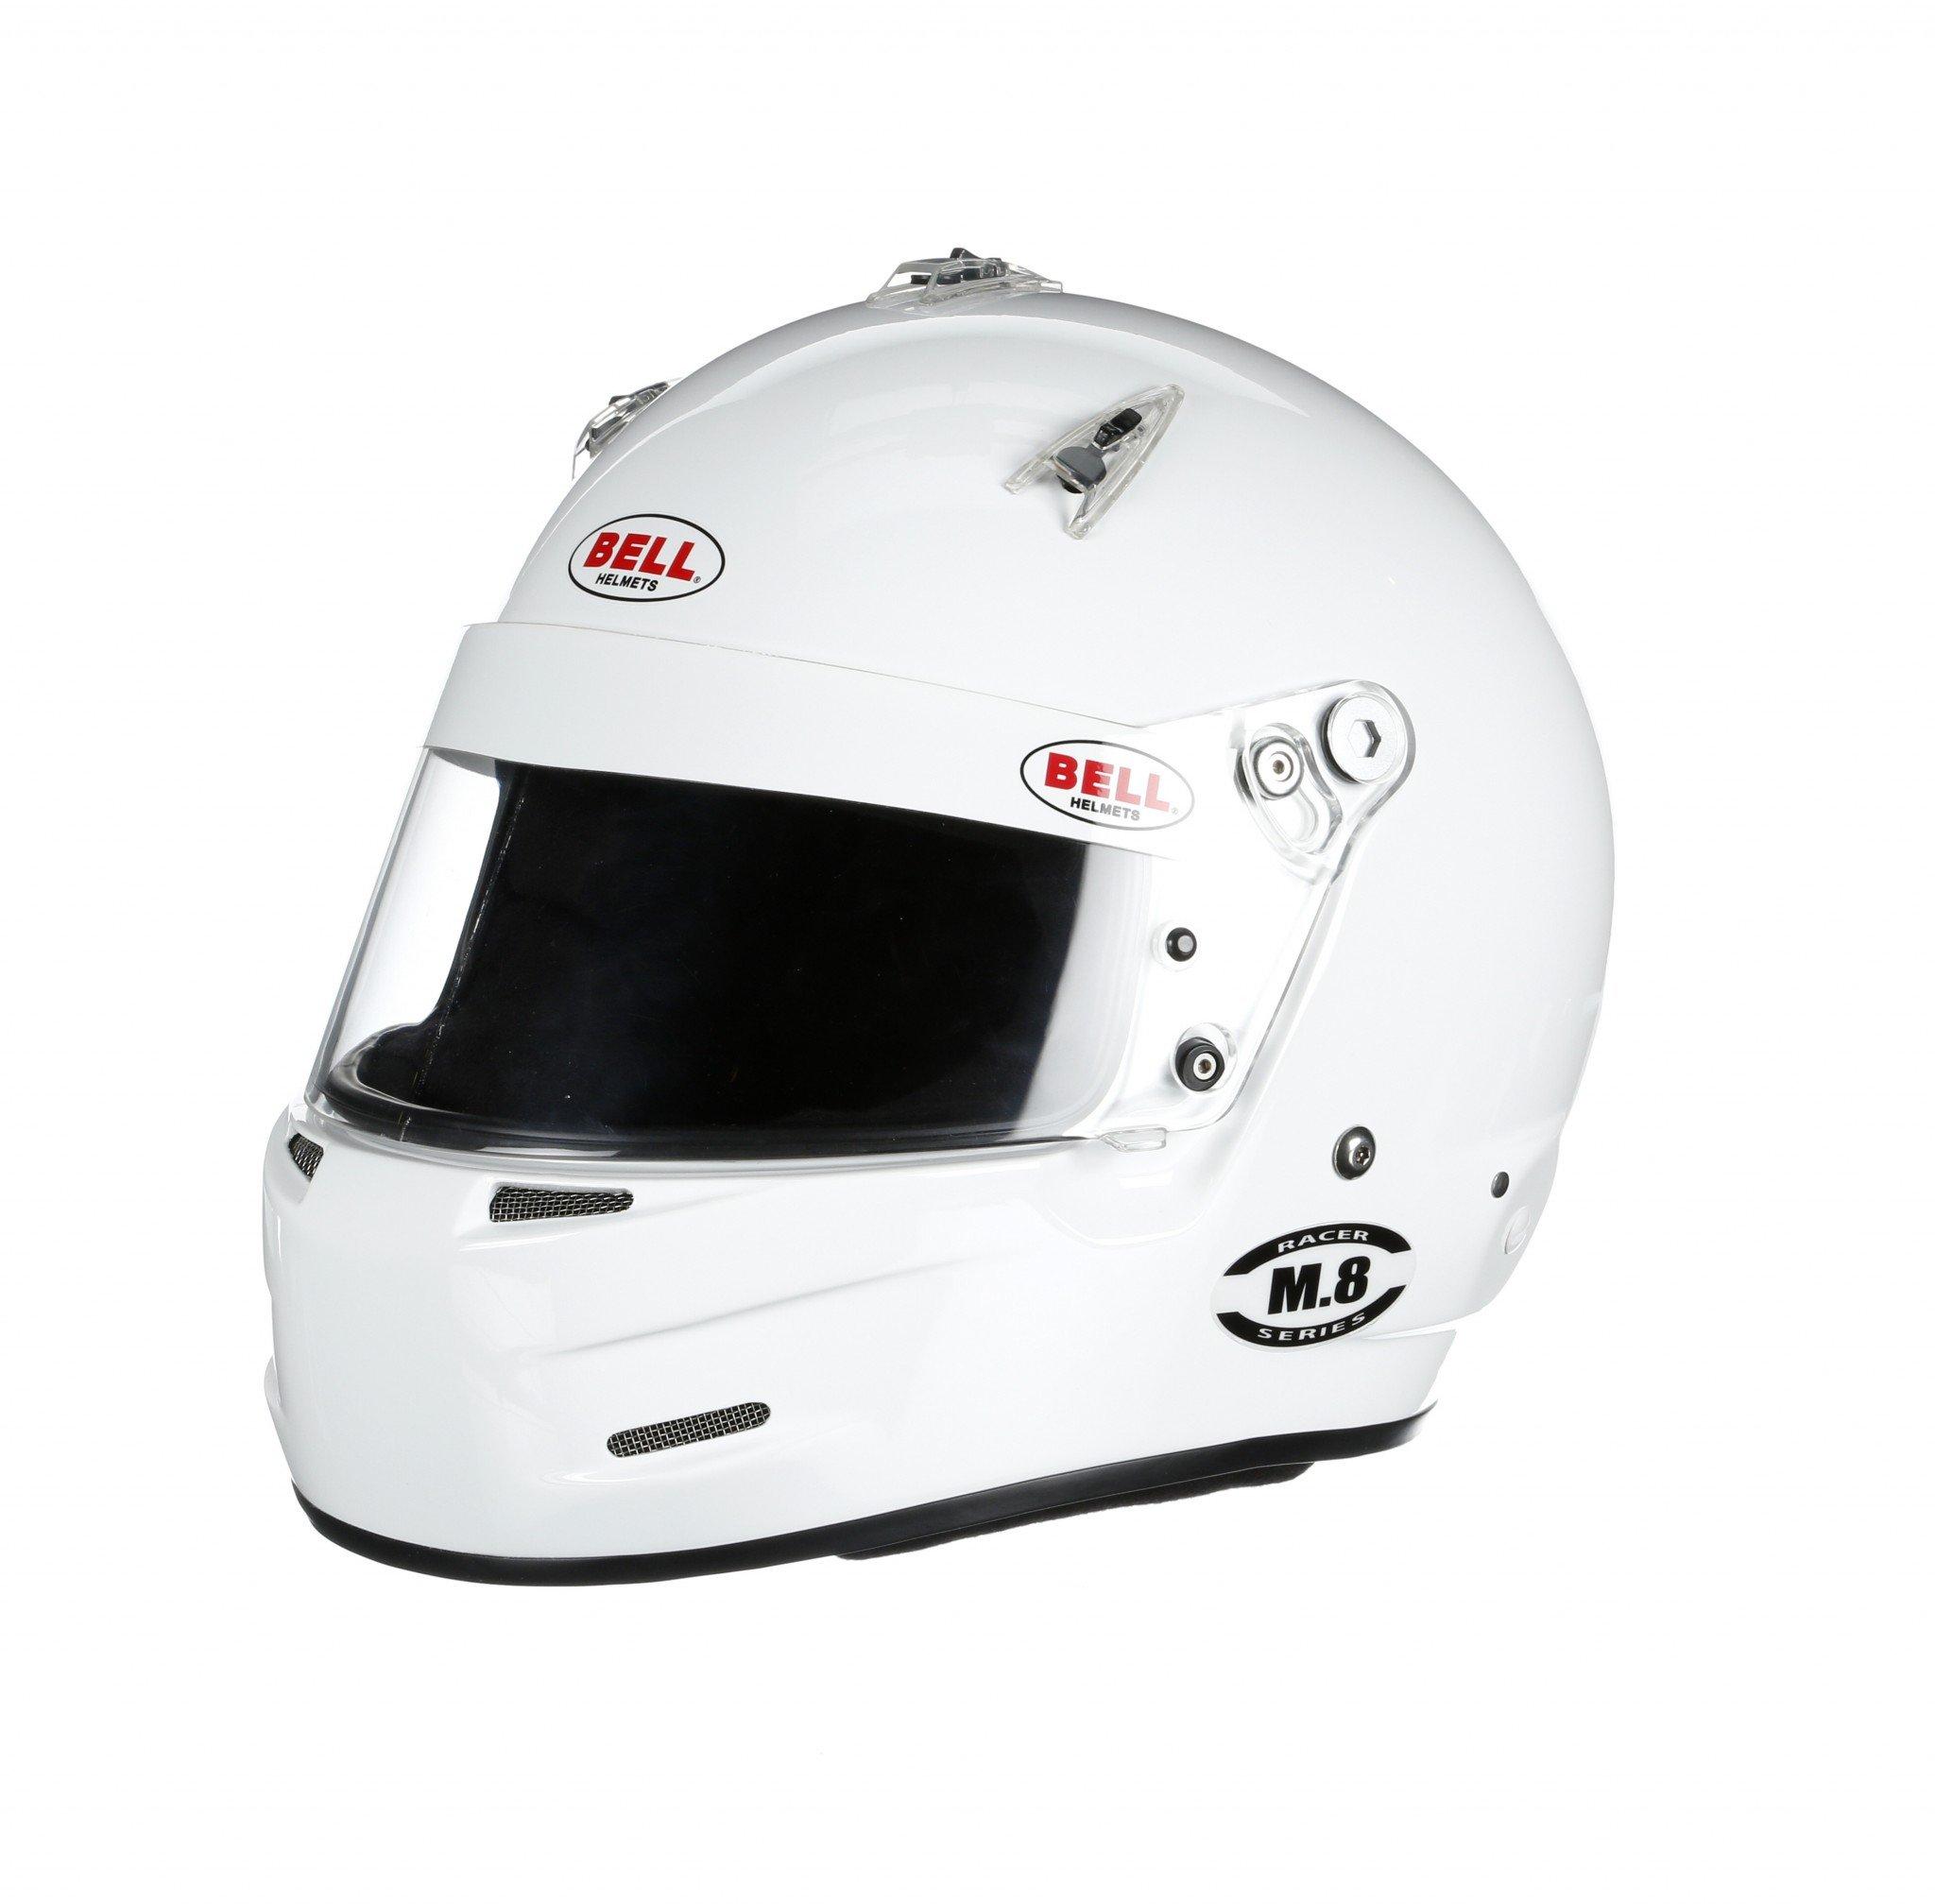 Bell 2016 Race Helmets, SA2015 RAce Helmets